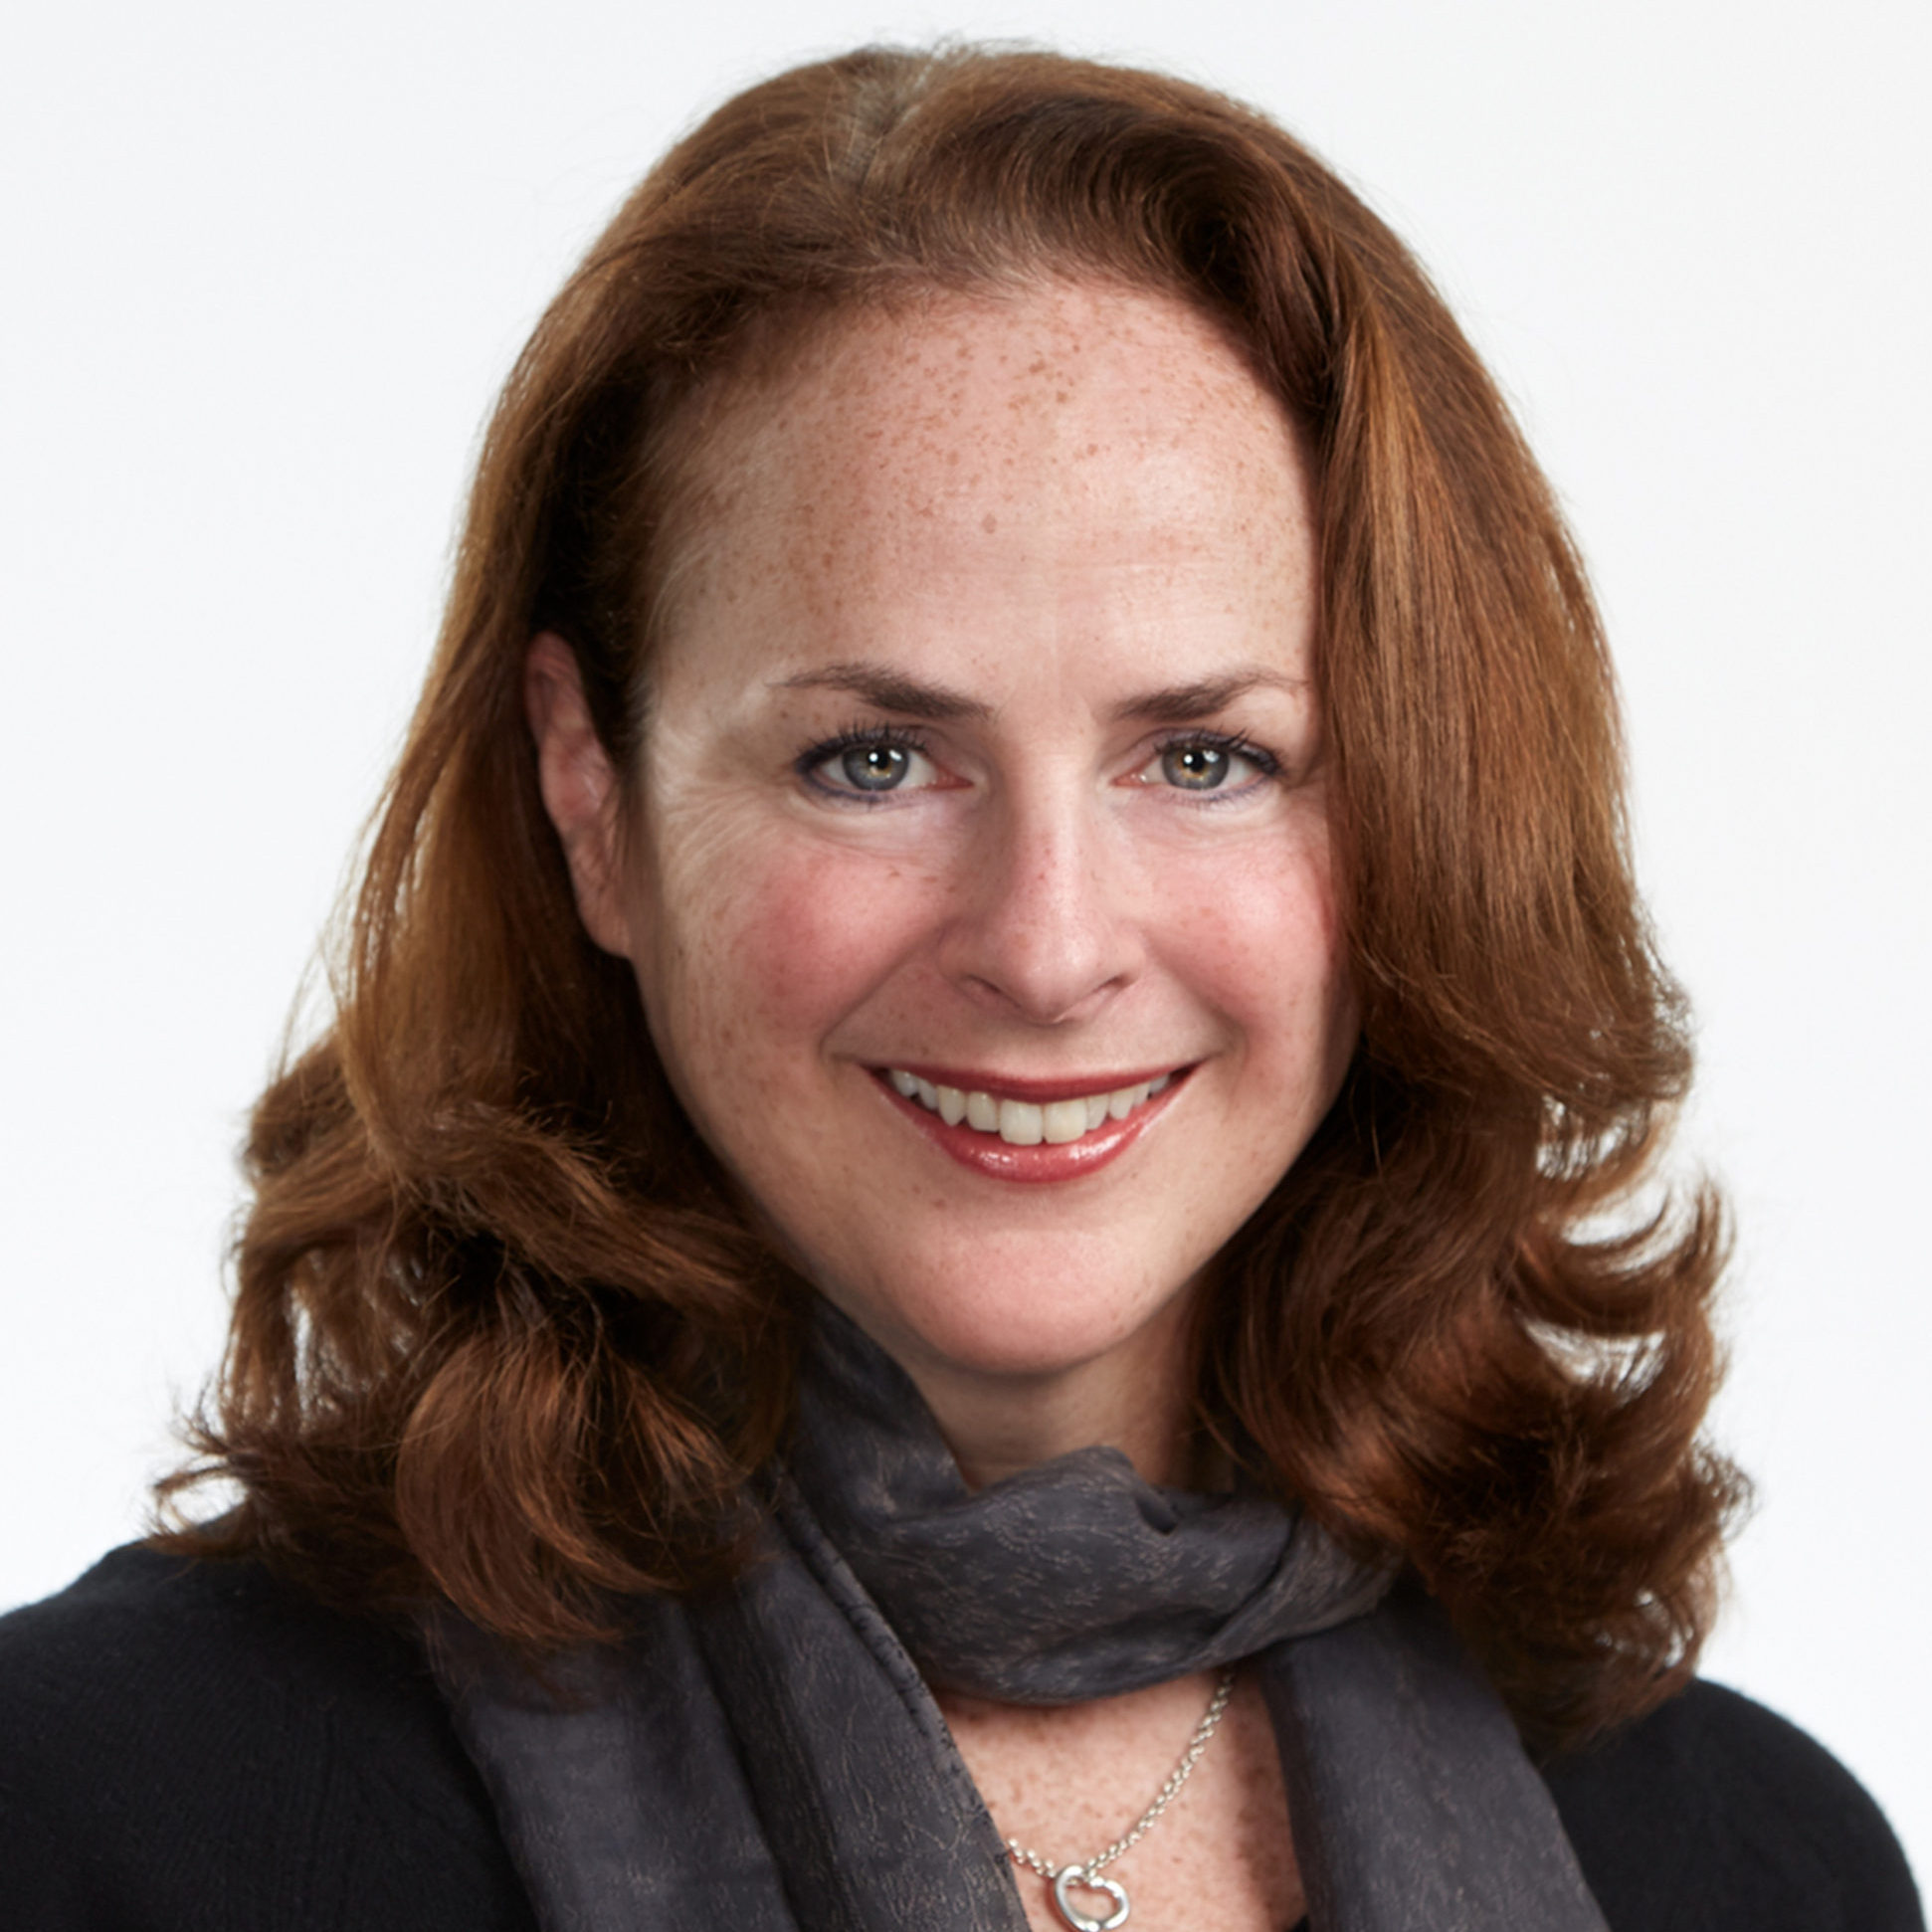 Elizabeth McIsaac